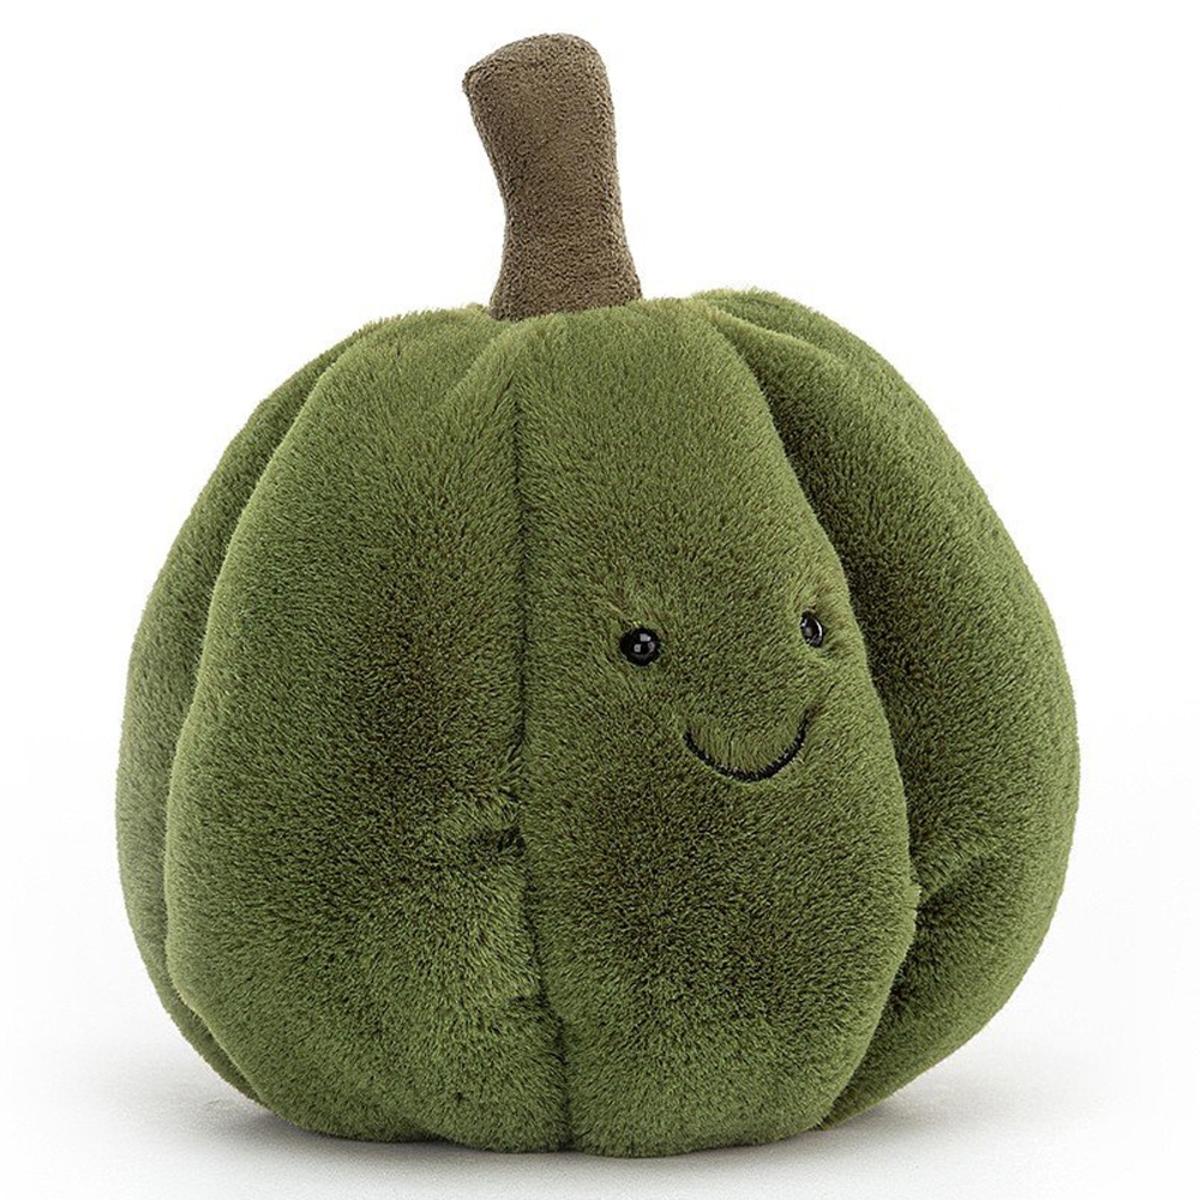 Peluche Squishy Squash Green Peluche Courge 18 cm